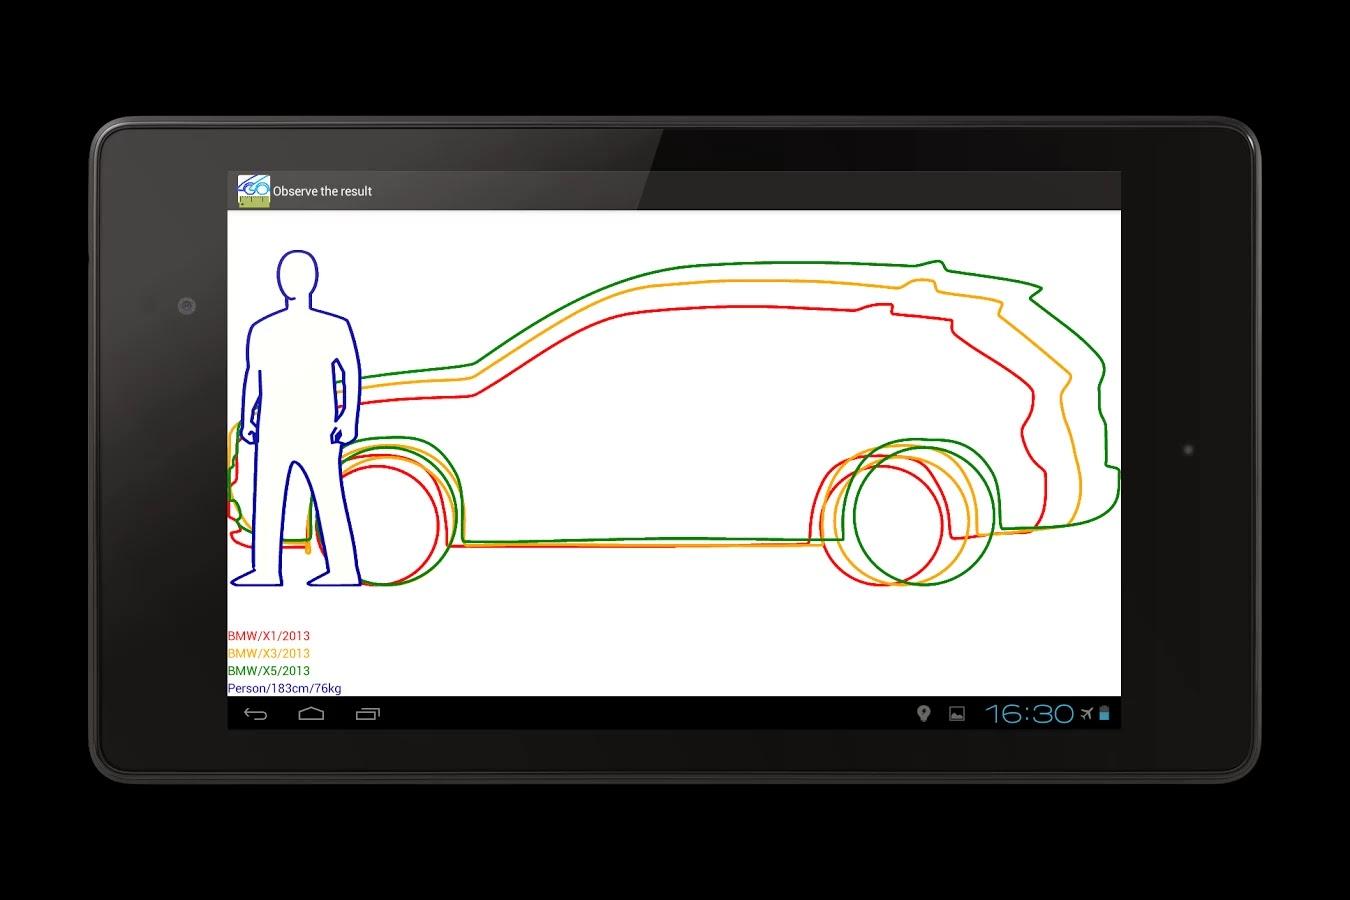 Volvo v40 cross country 2013 vs mercedes benz gla 2014 compare dimensions visually www car